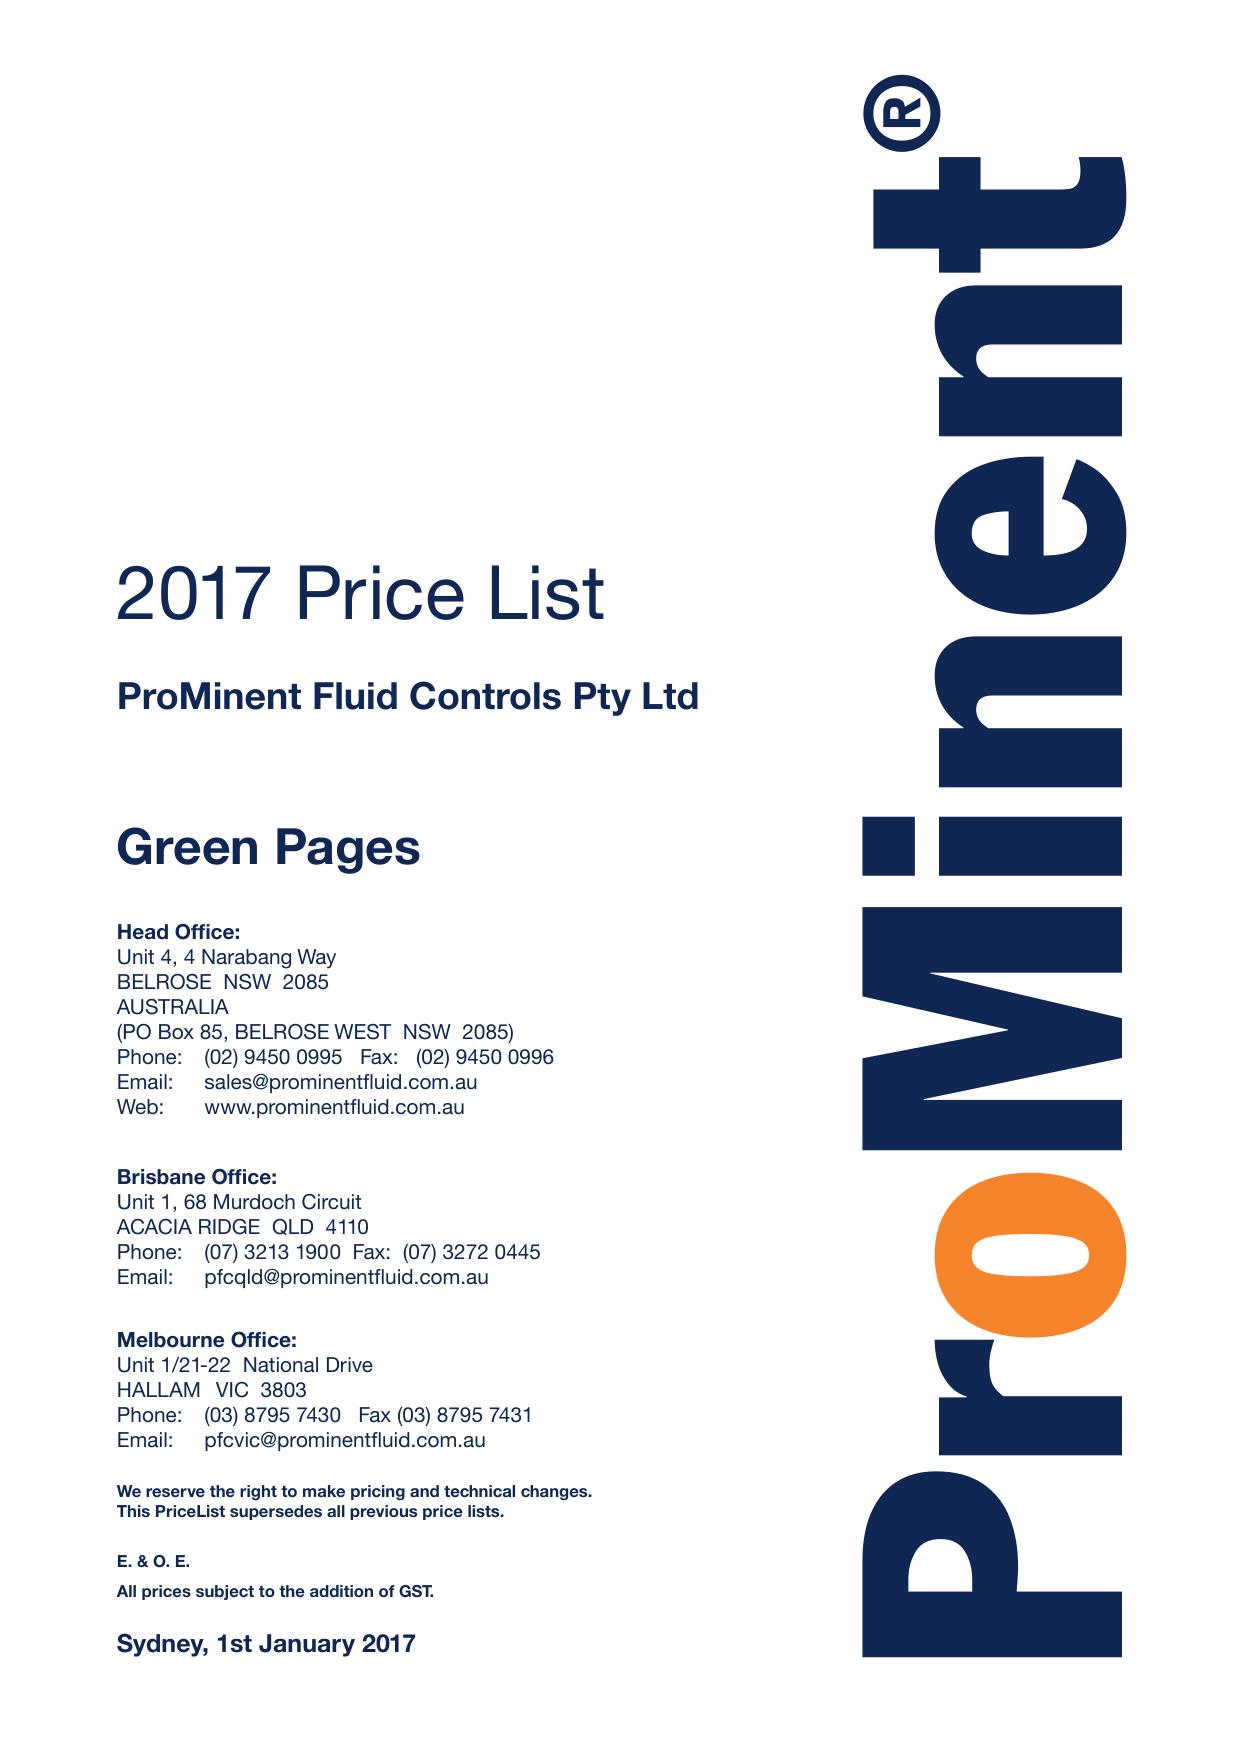 2017 Price List - Prominent Fluid Controls Australia